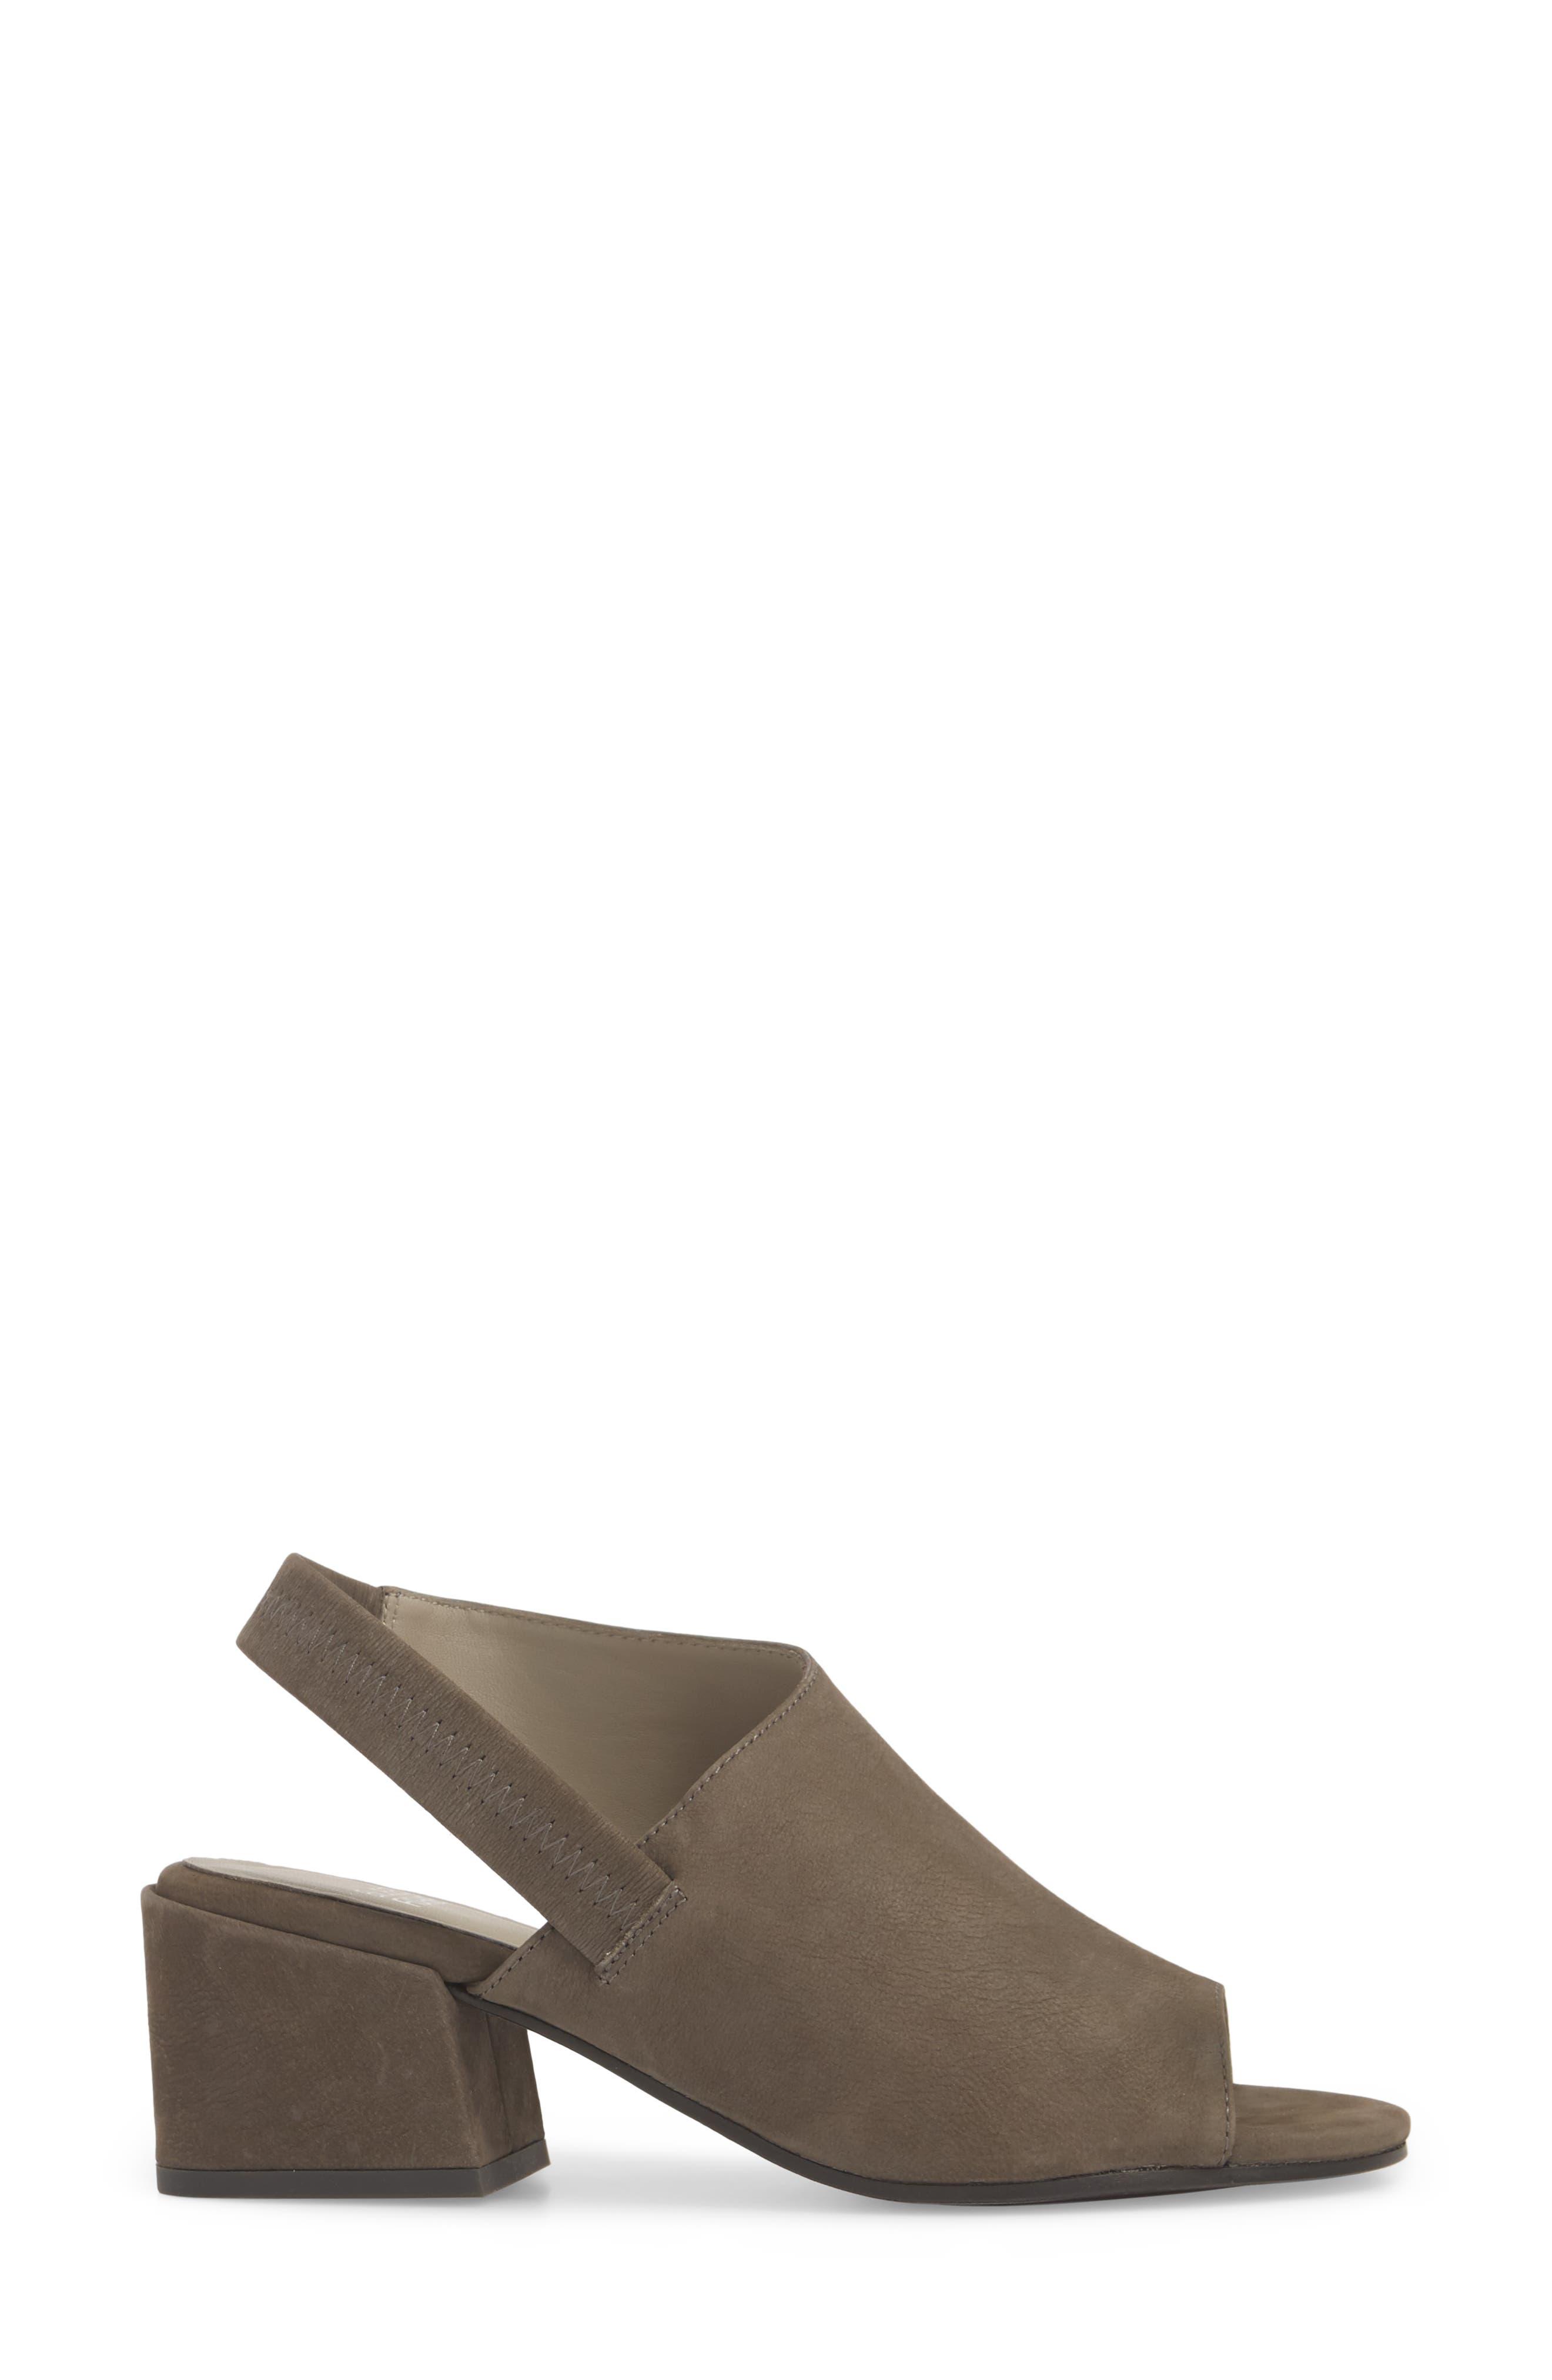 Leigh Asymmetrical Slingback Sandal,                             Alternate thumbnail 9, color,